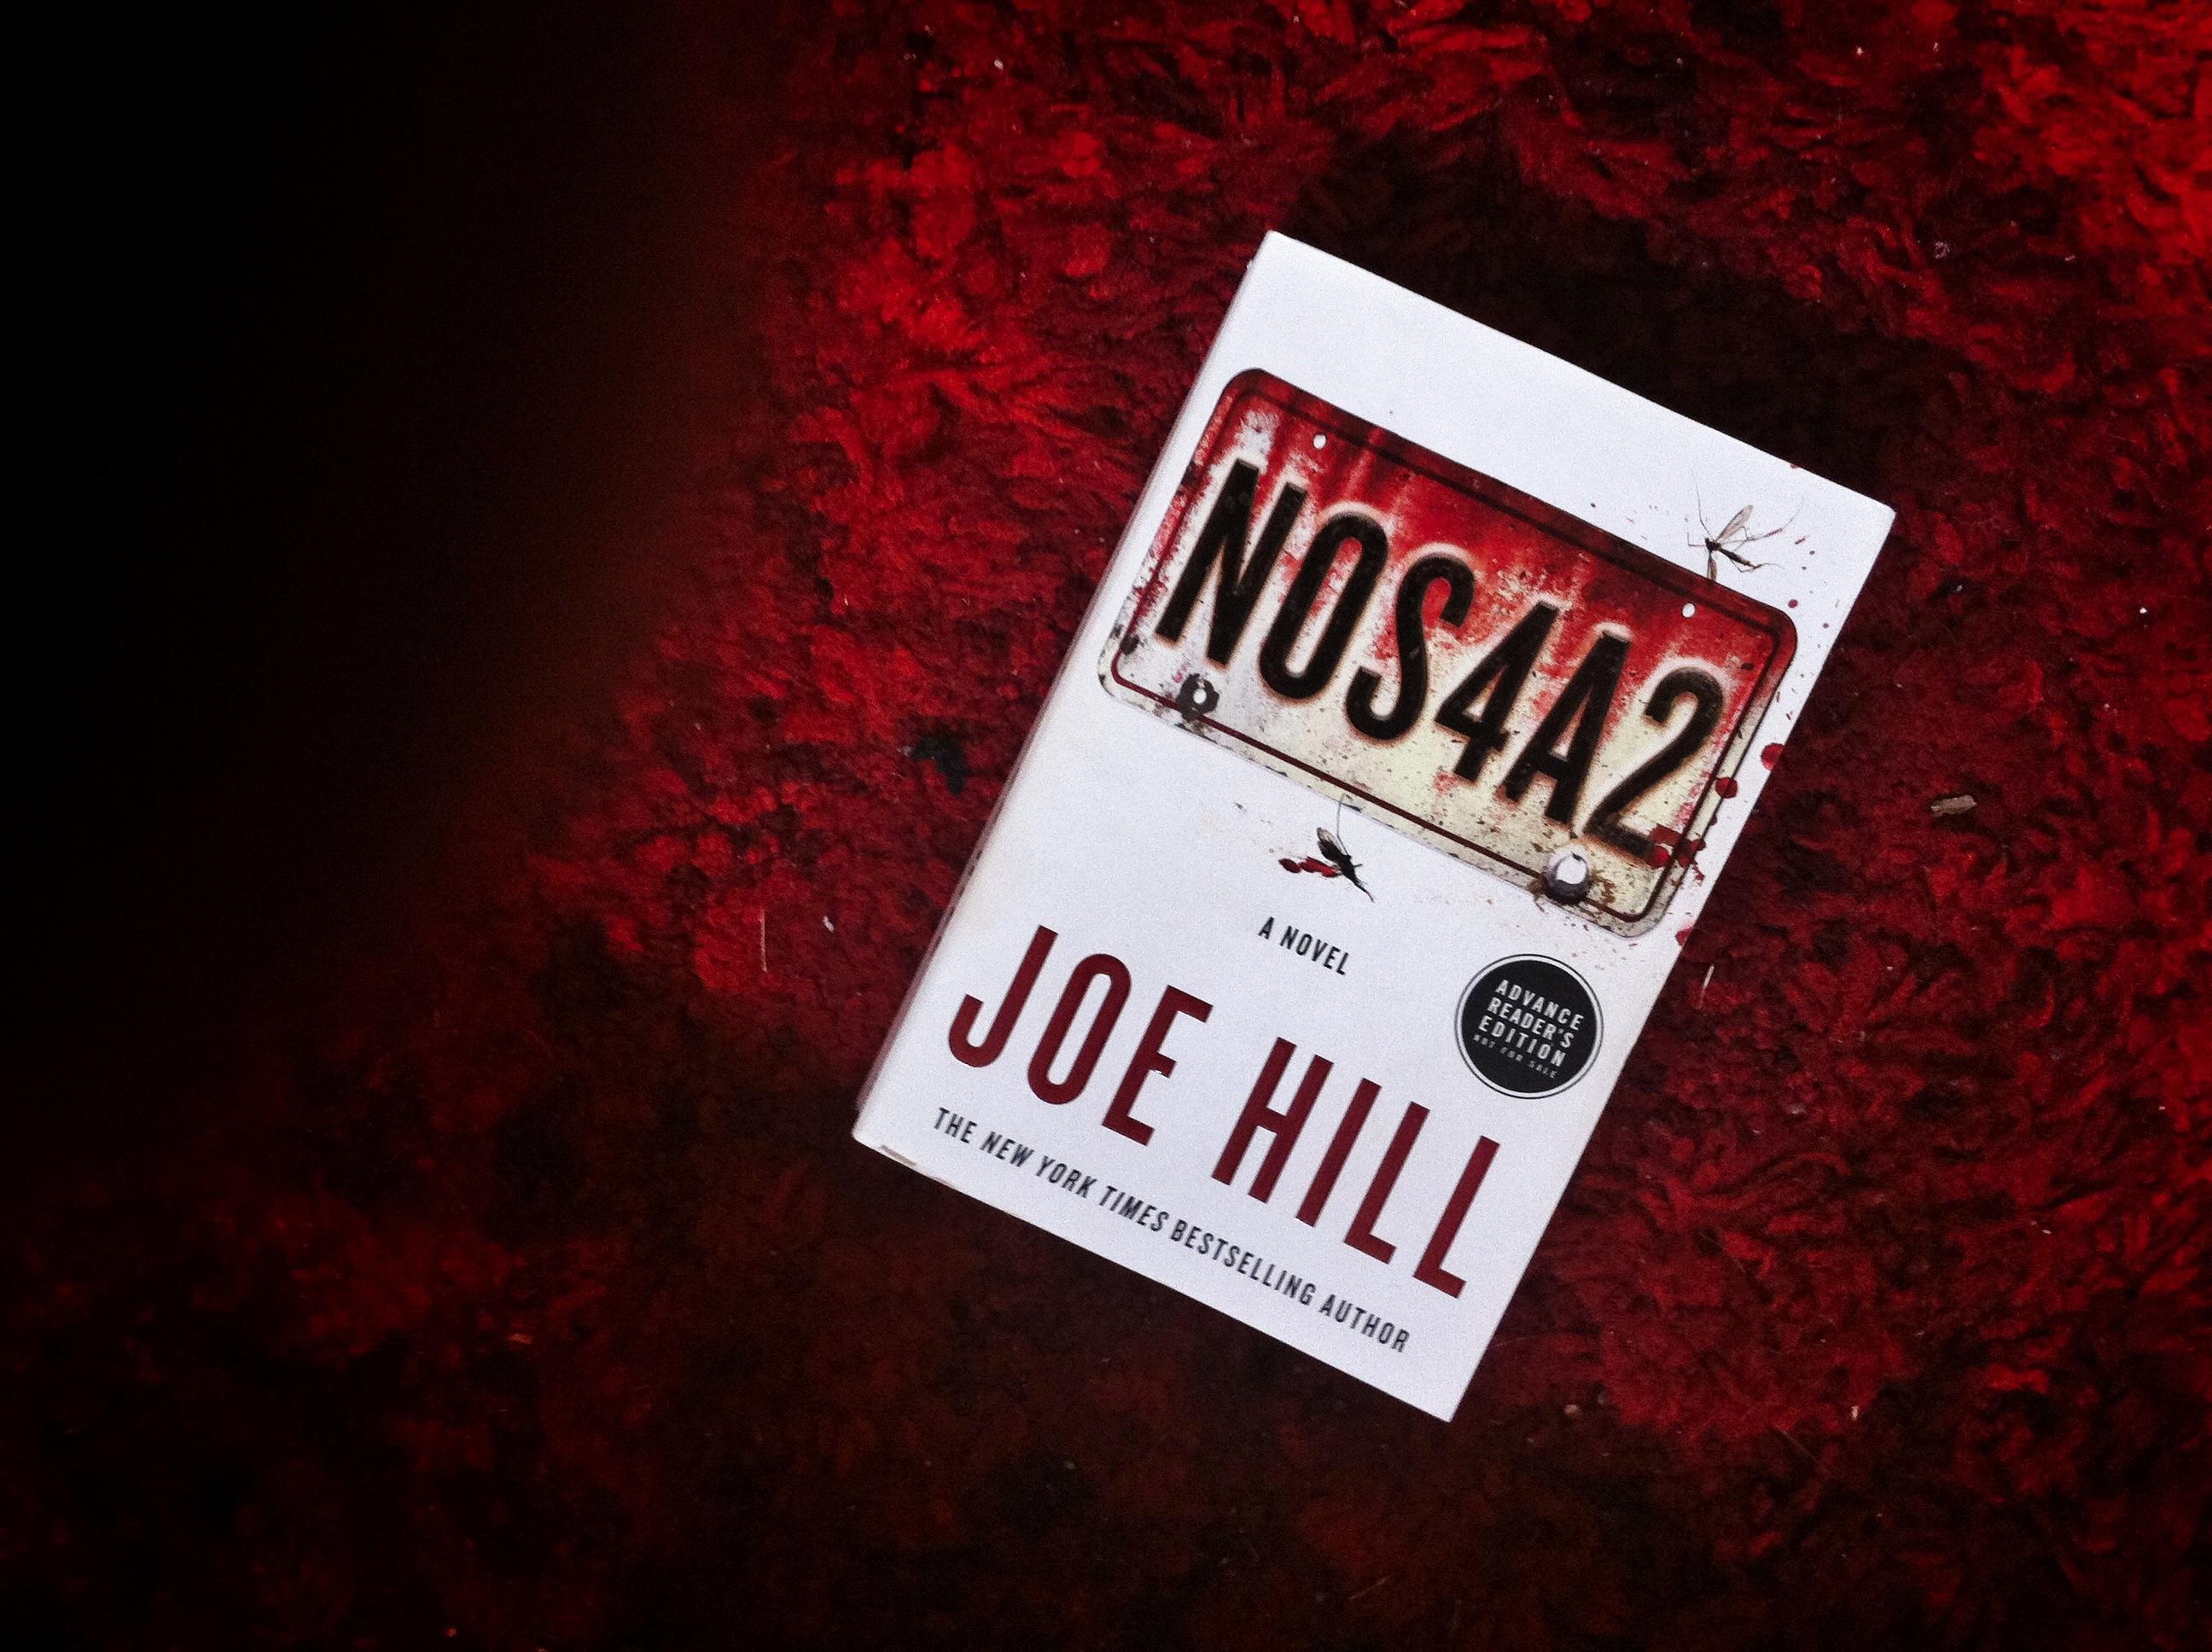 NOS4A2 : la nouvelle série « Neo-Vampire Horror Drama » de AMC